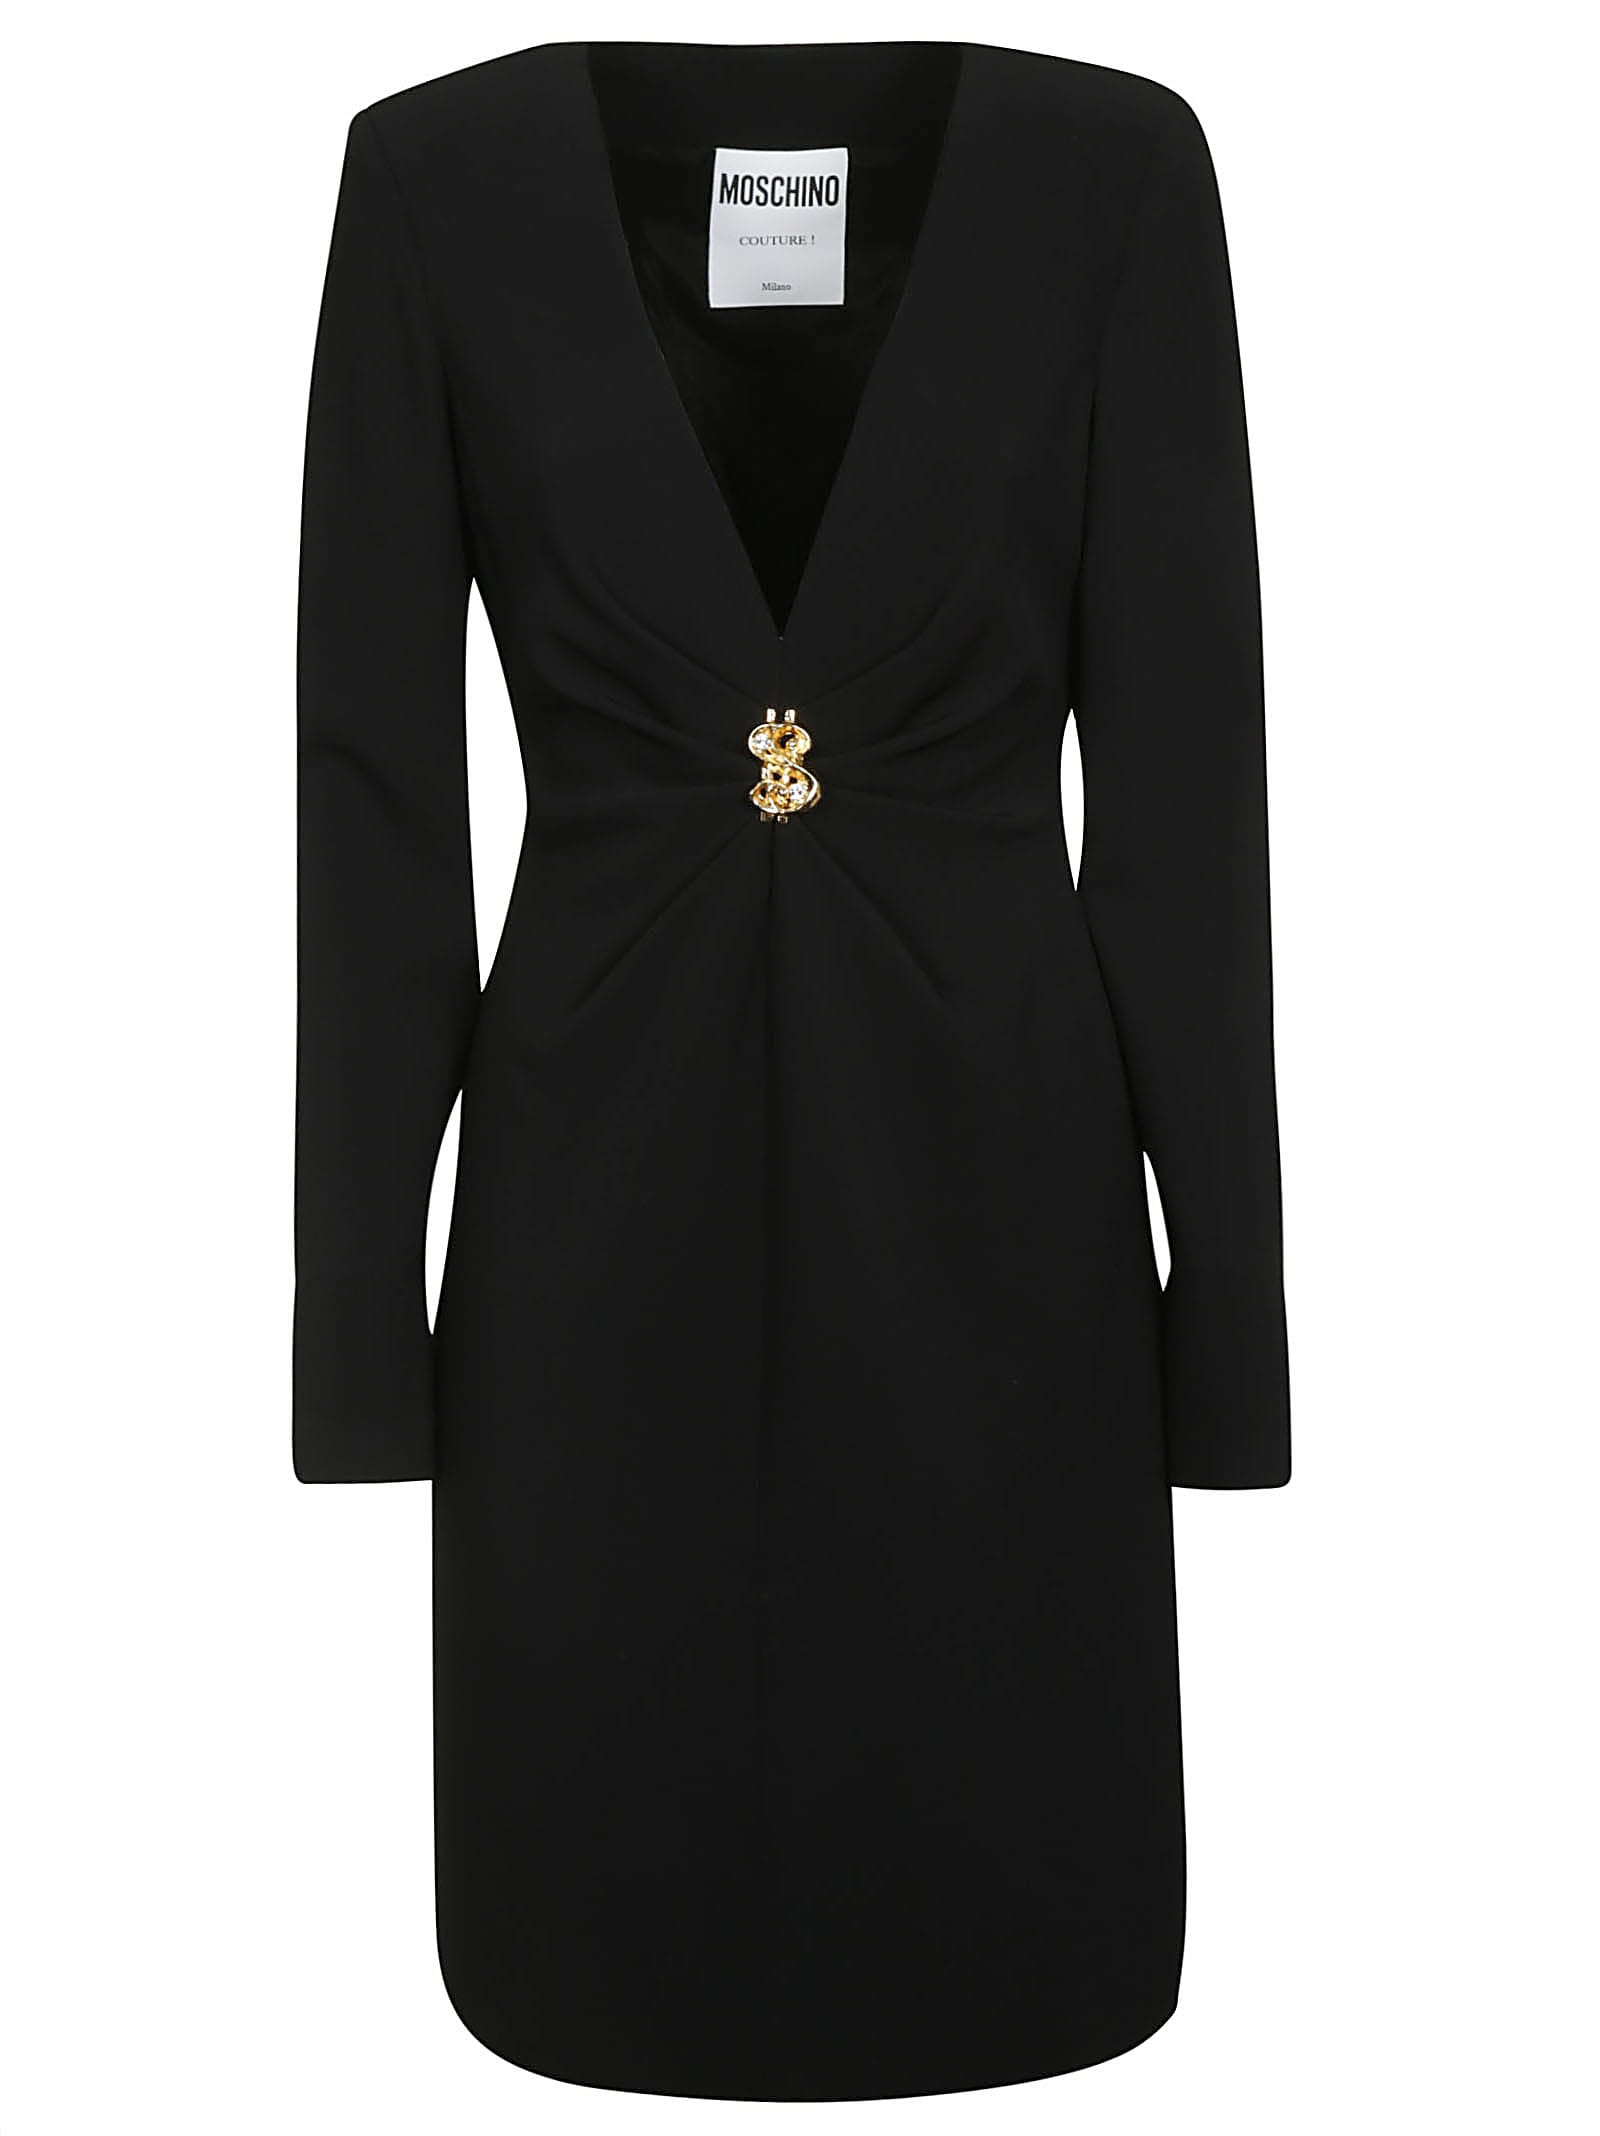 Moschino Embellished Dress